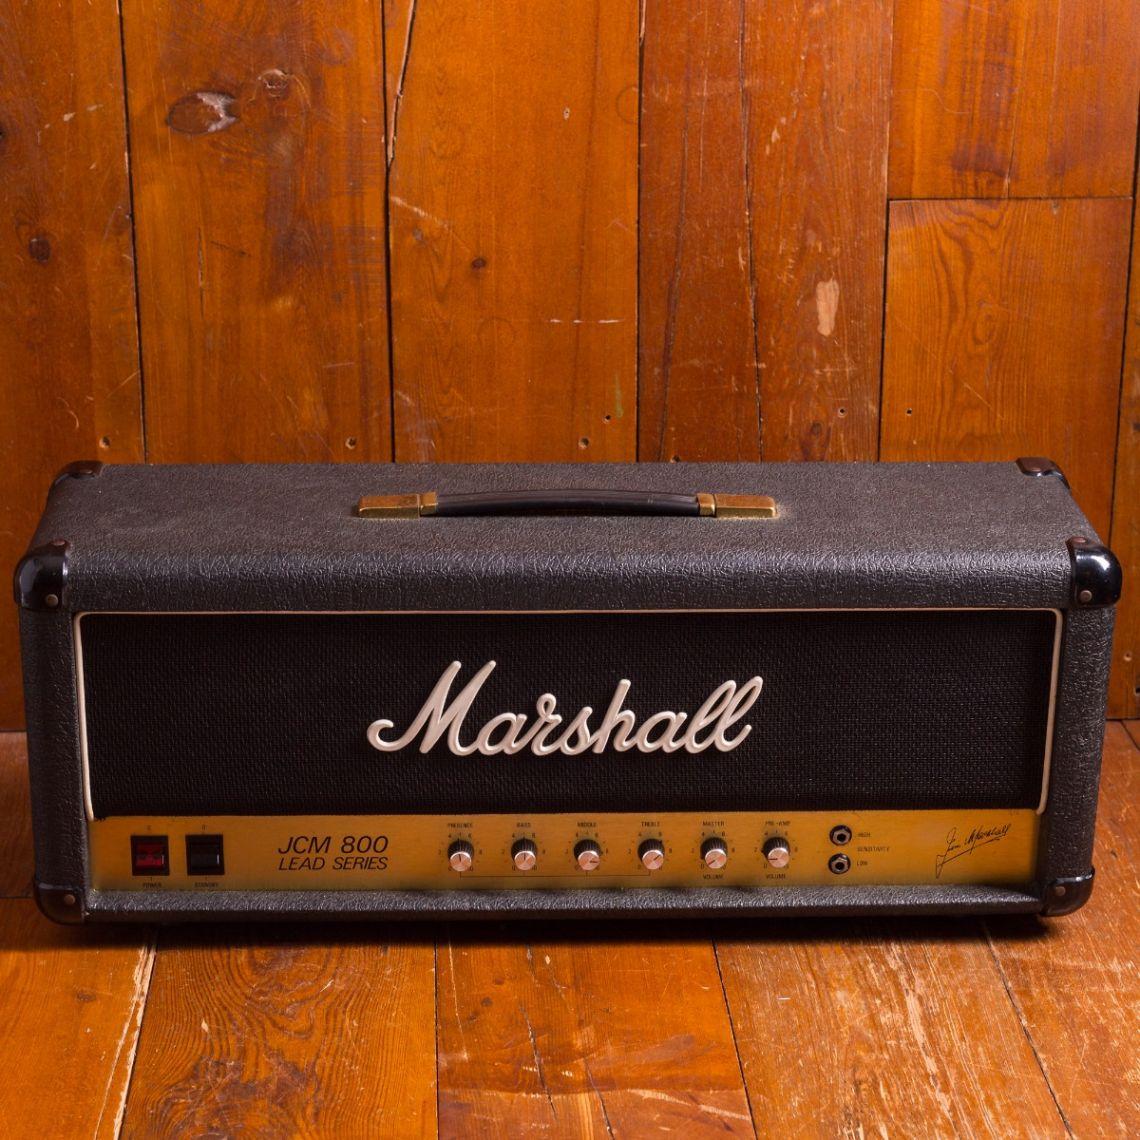 800 marshall jcm JCM800 2203